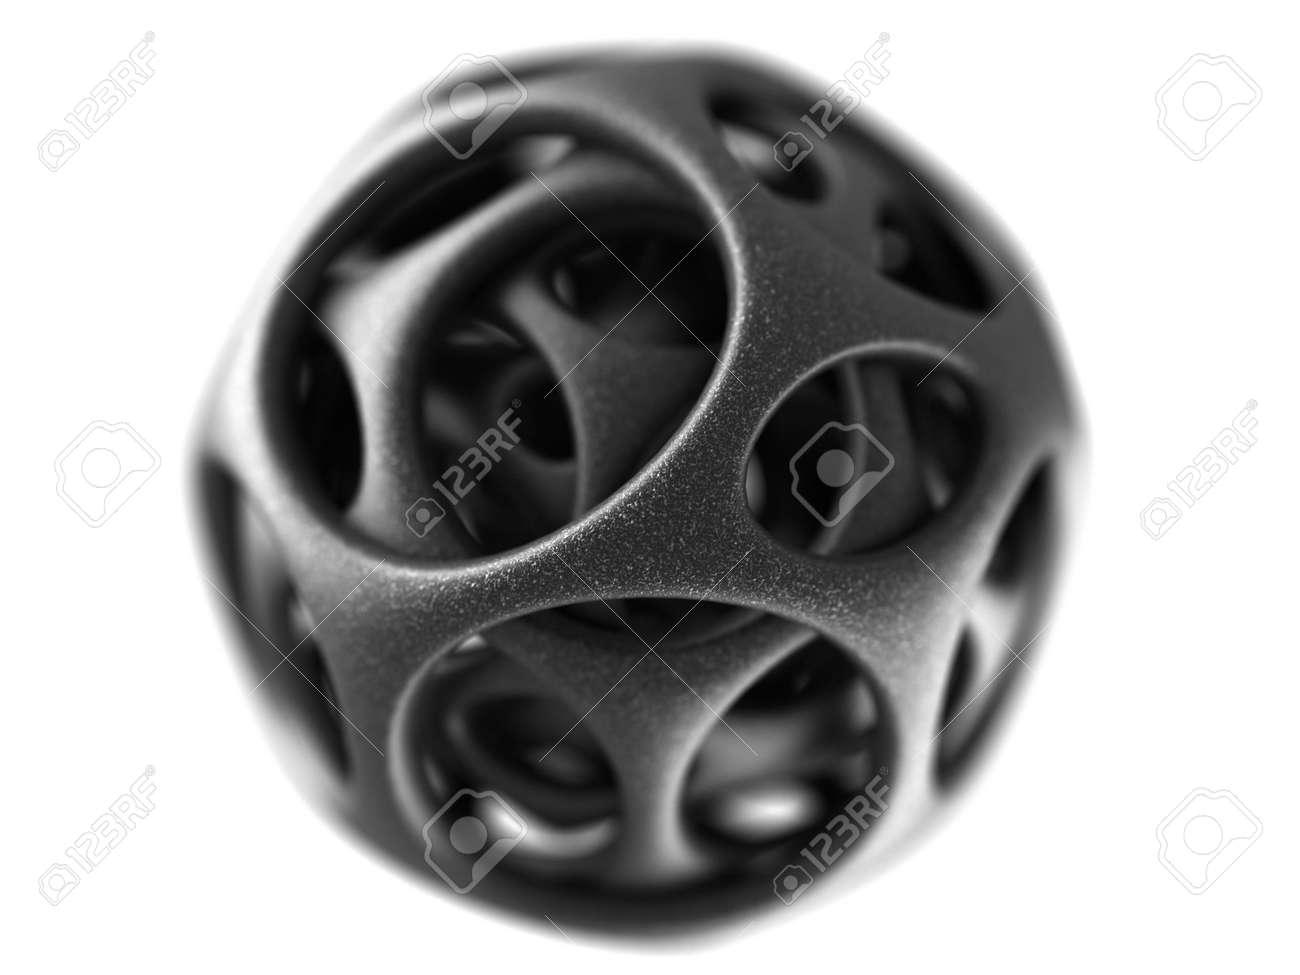 steel spherical designer made in 3D Stock Photo - 5694498